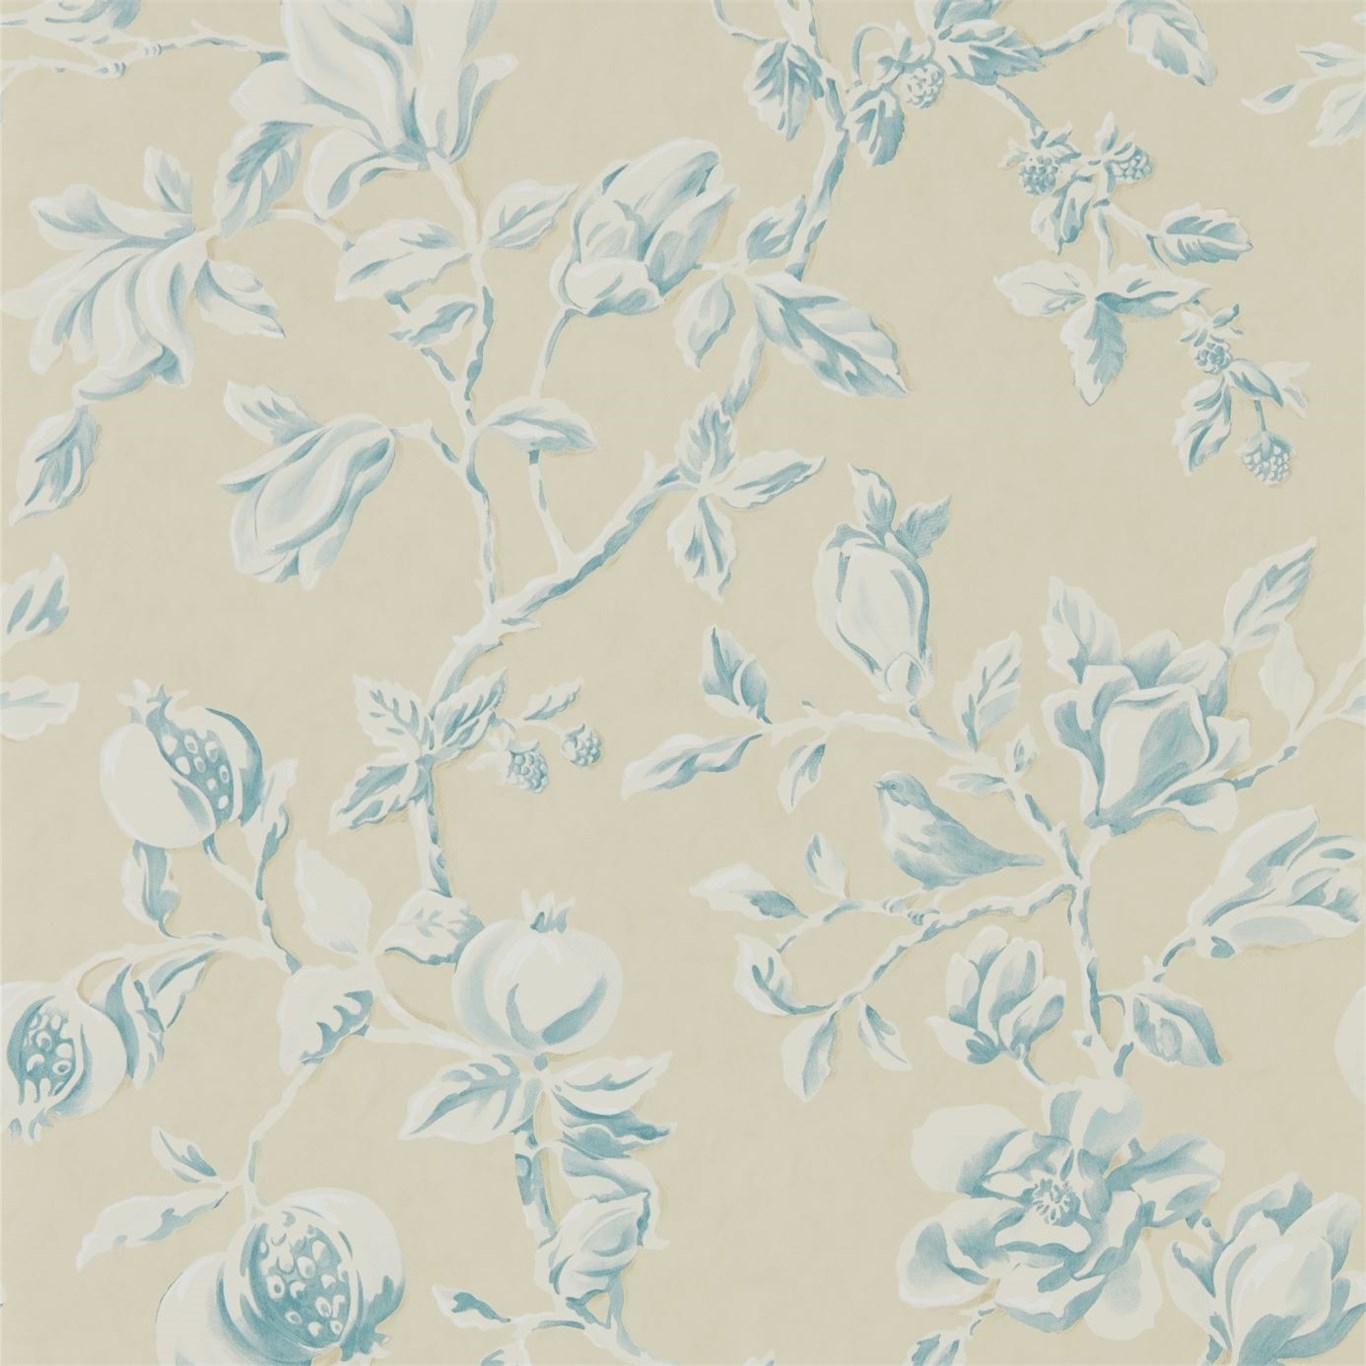 Papel pintado sanderson magnolia pomegranate 215725 - Sanderson papel pintado ...